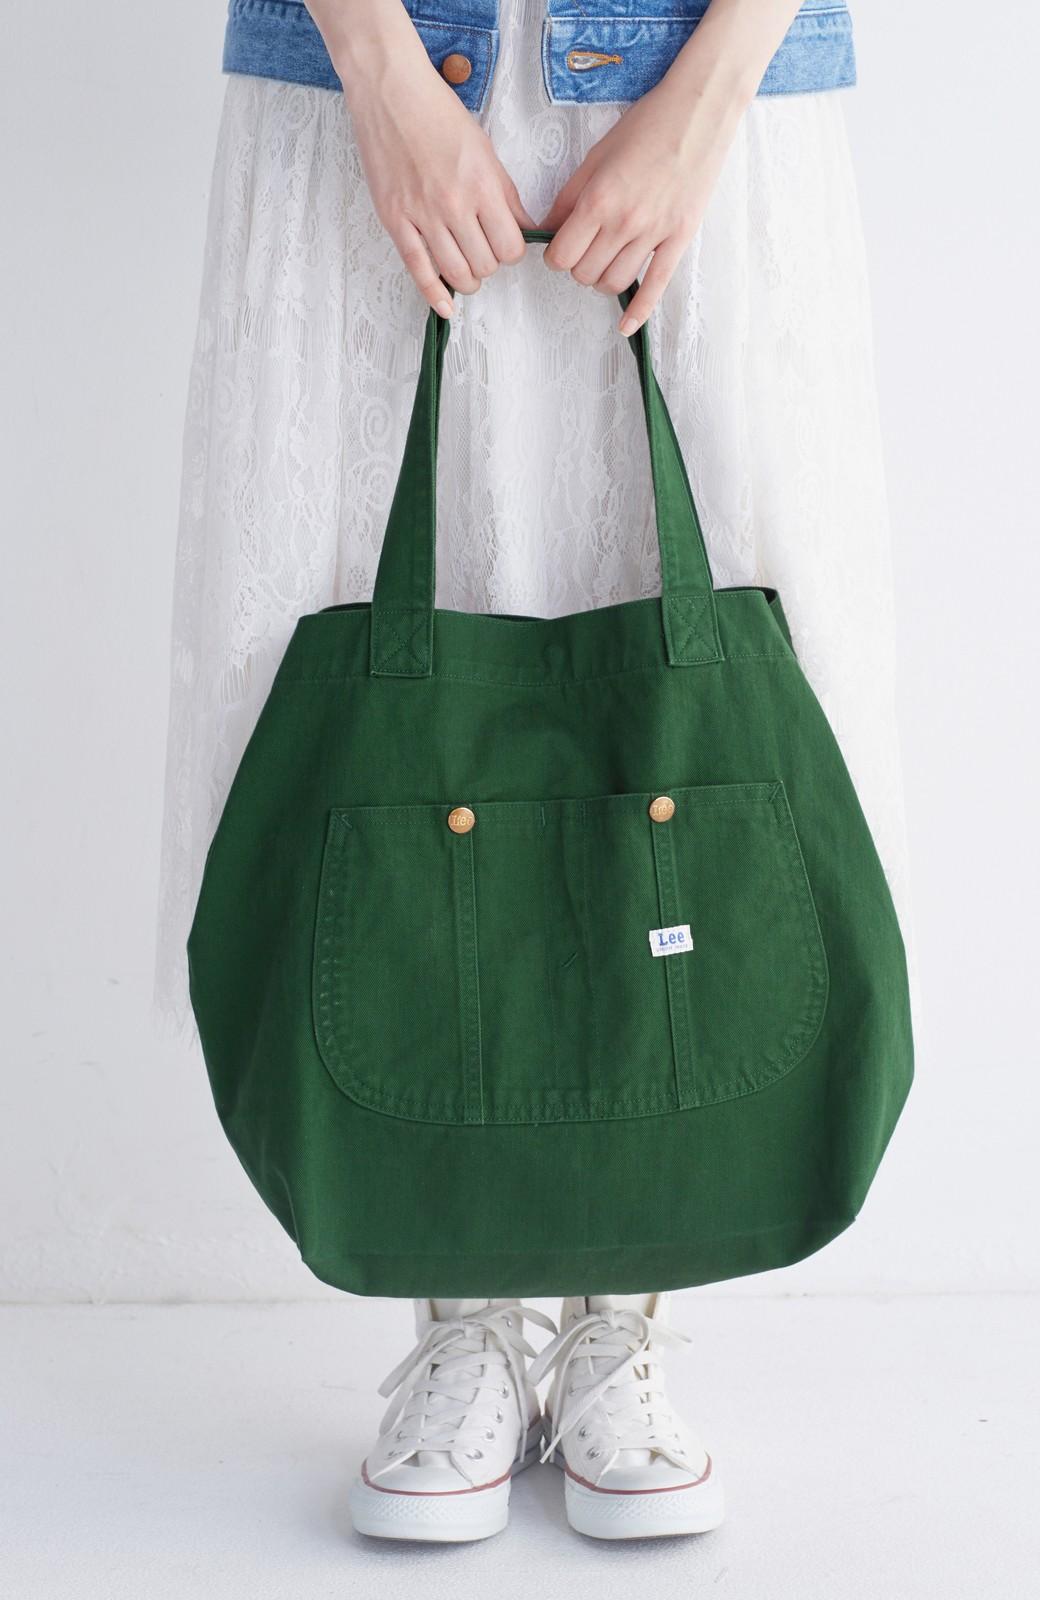 haco! Lee 大きい野菜もらくらく入るエコショッピングバッグ <グリーン>の商品写真12